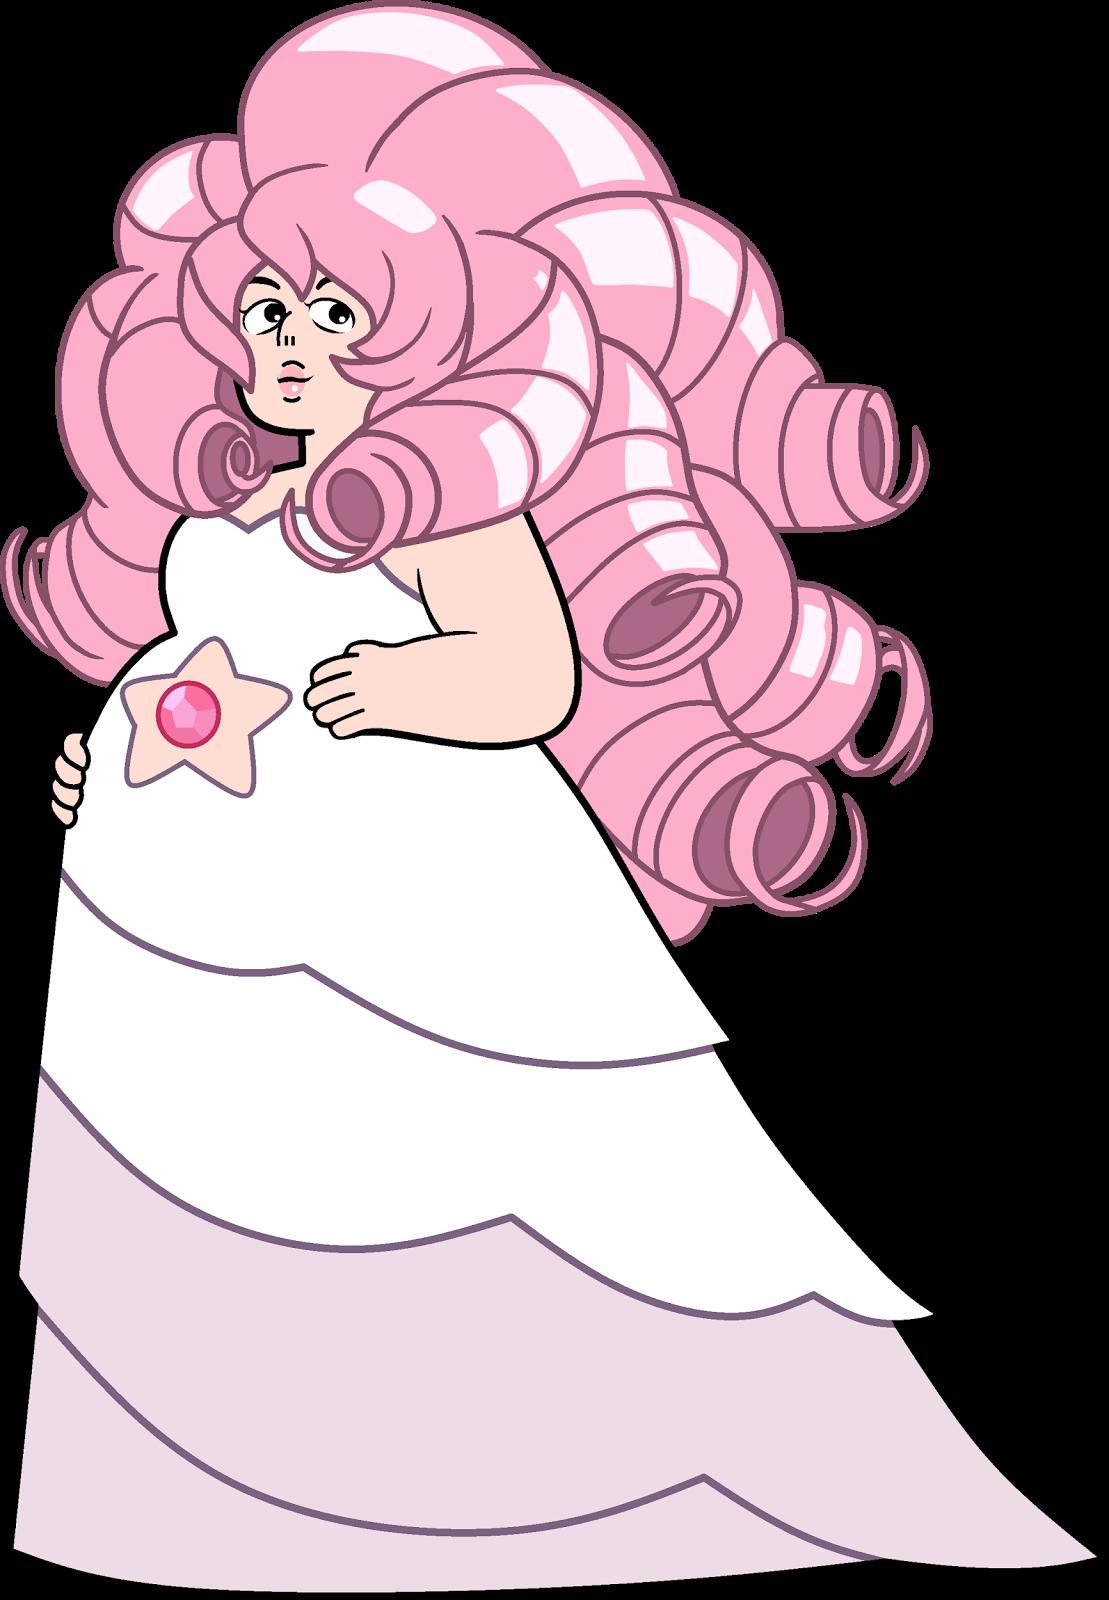 Rose Quartz Steven Universe Hair Template: Steven Universe: Rocks That Make You Cry